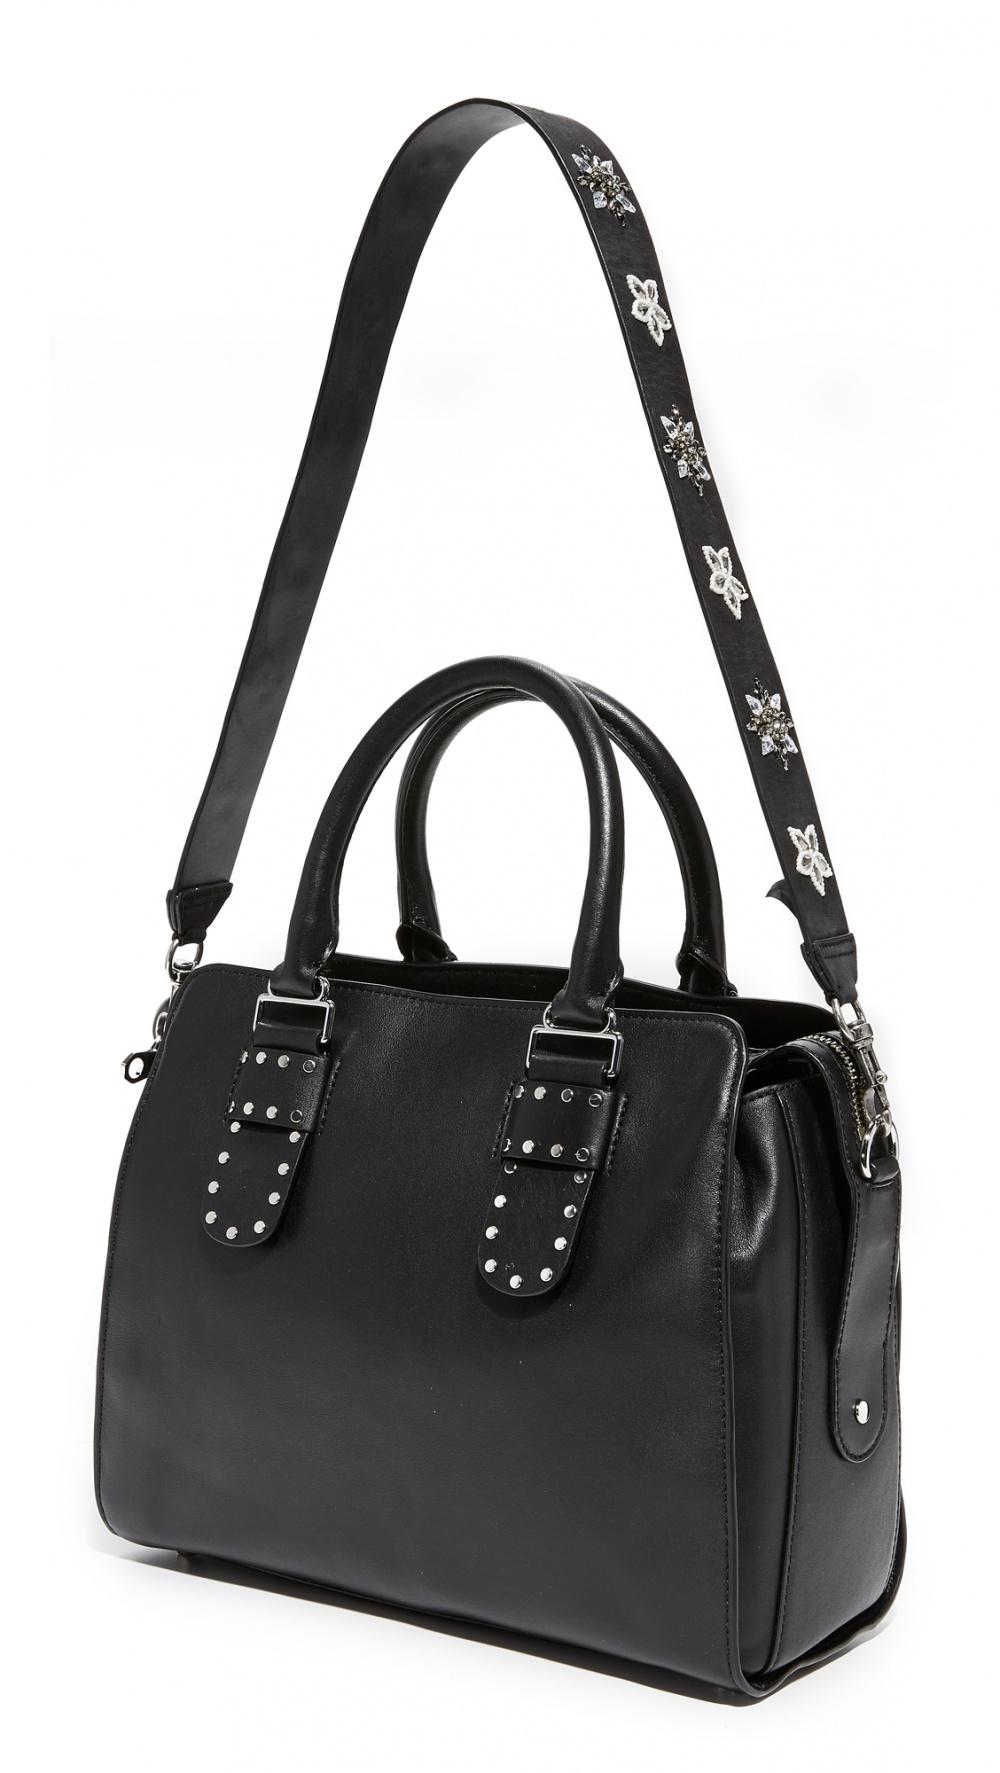 Кожаный ремень для сумки Rebecca Minkoff